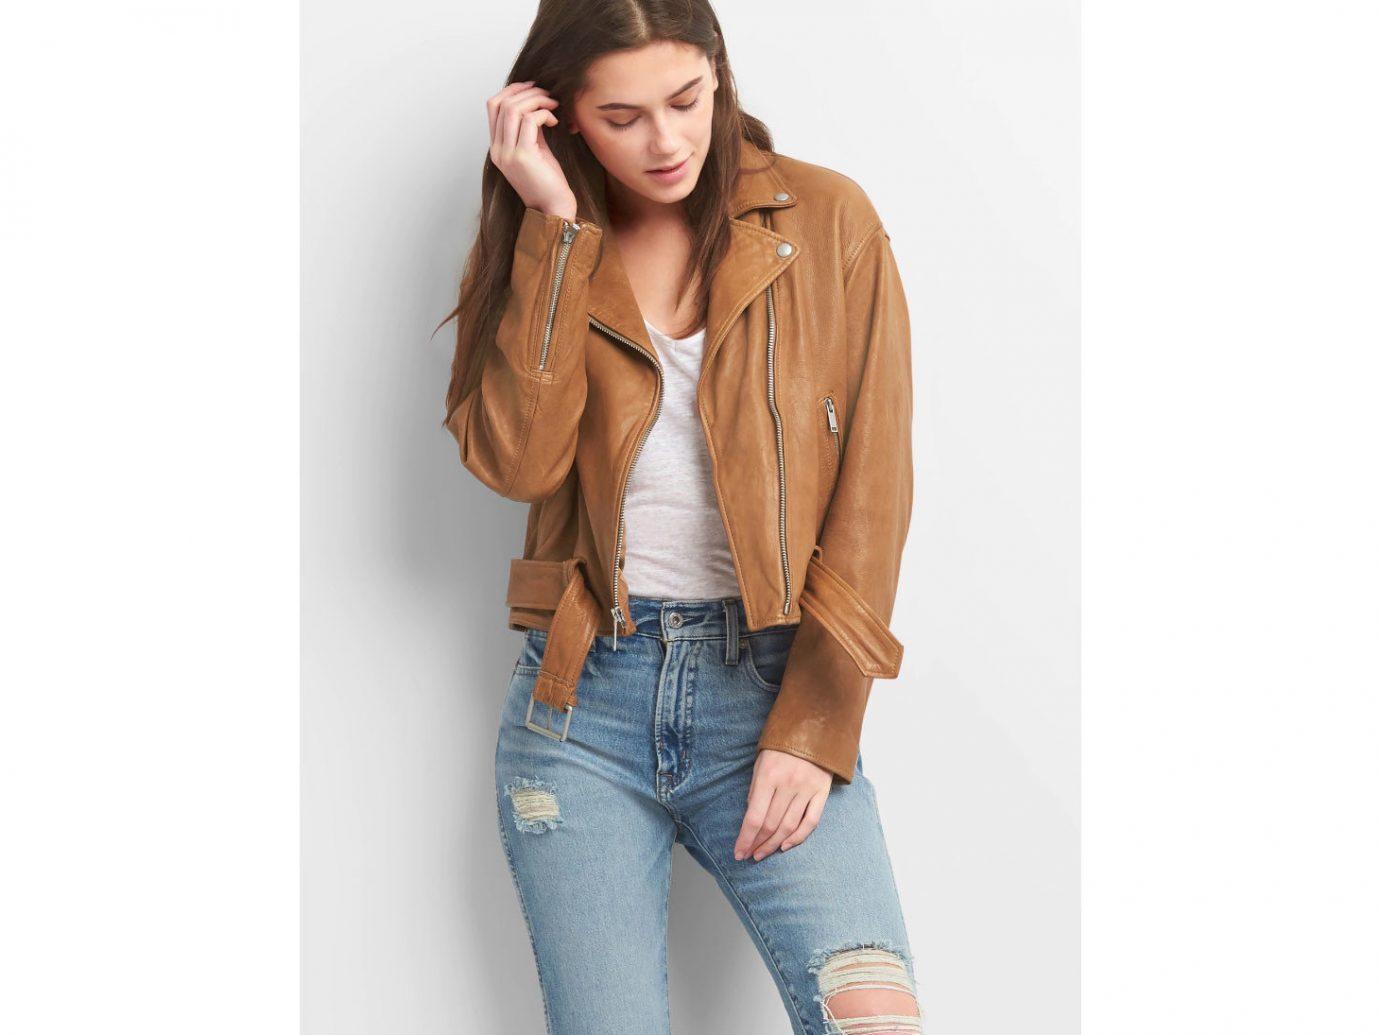 Packing Tips Style + Design Travel Shop clothing person jacket fashion model leather jacket jeans posing sleeve leather waist neck beige denim trouser